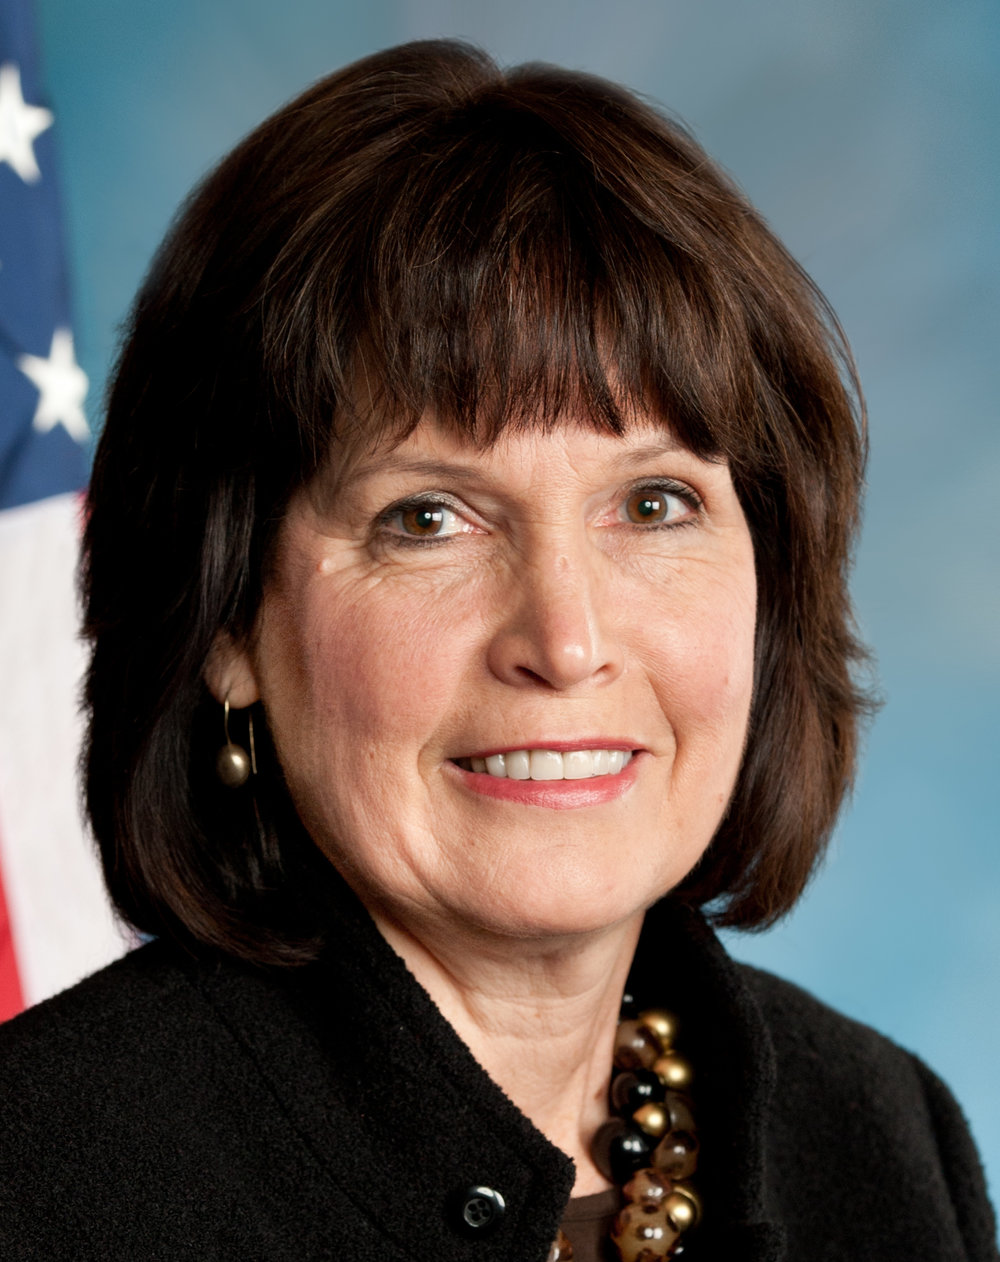 Minnesota's Rep. Betty McCollum. Credit: U.S.House Office of Photography.